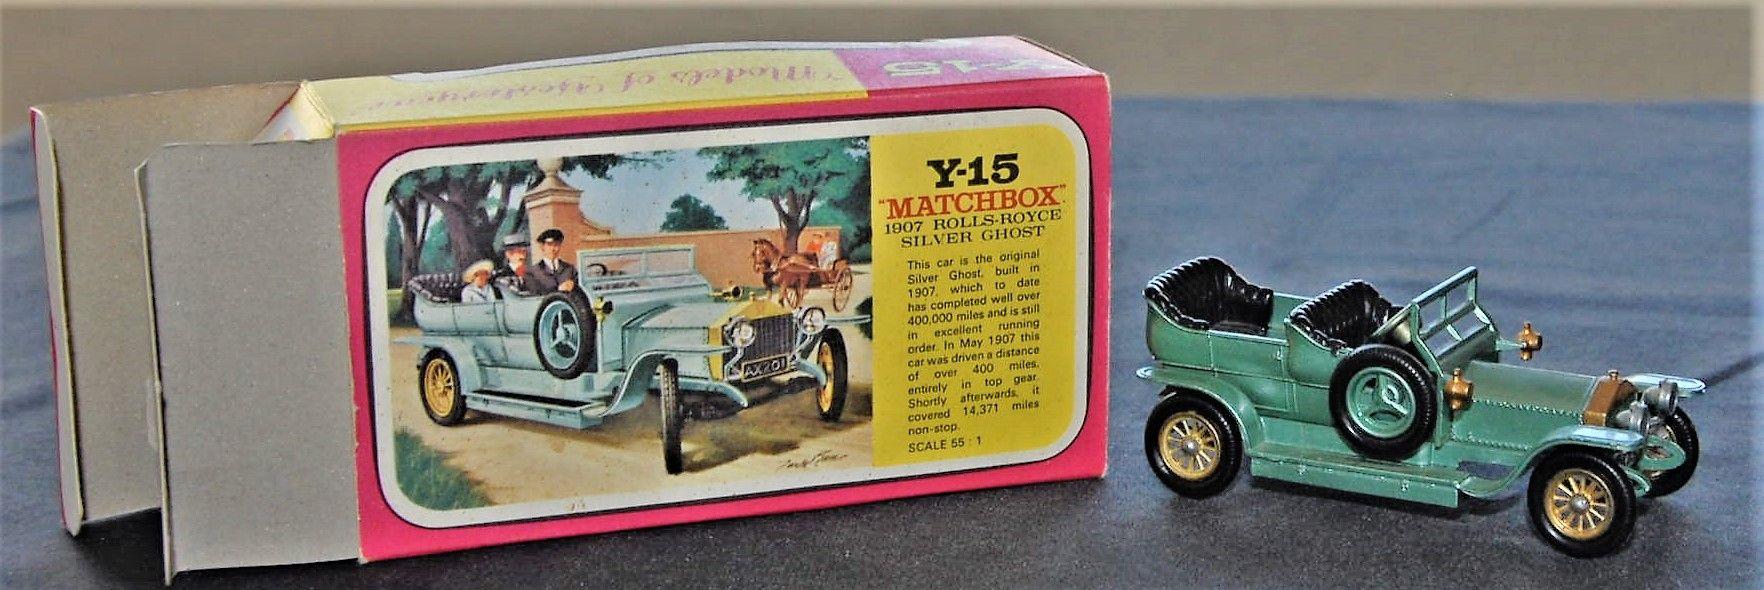 Pin de Rod South en Matchbox Models of Yesteryear | Toys